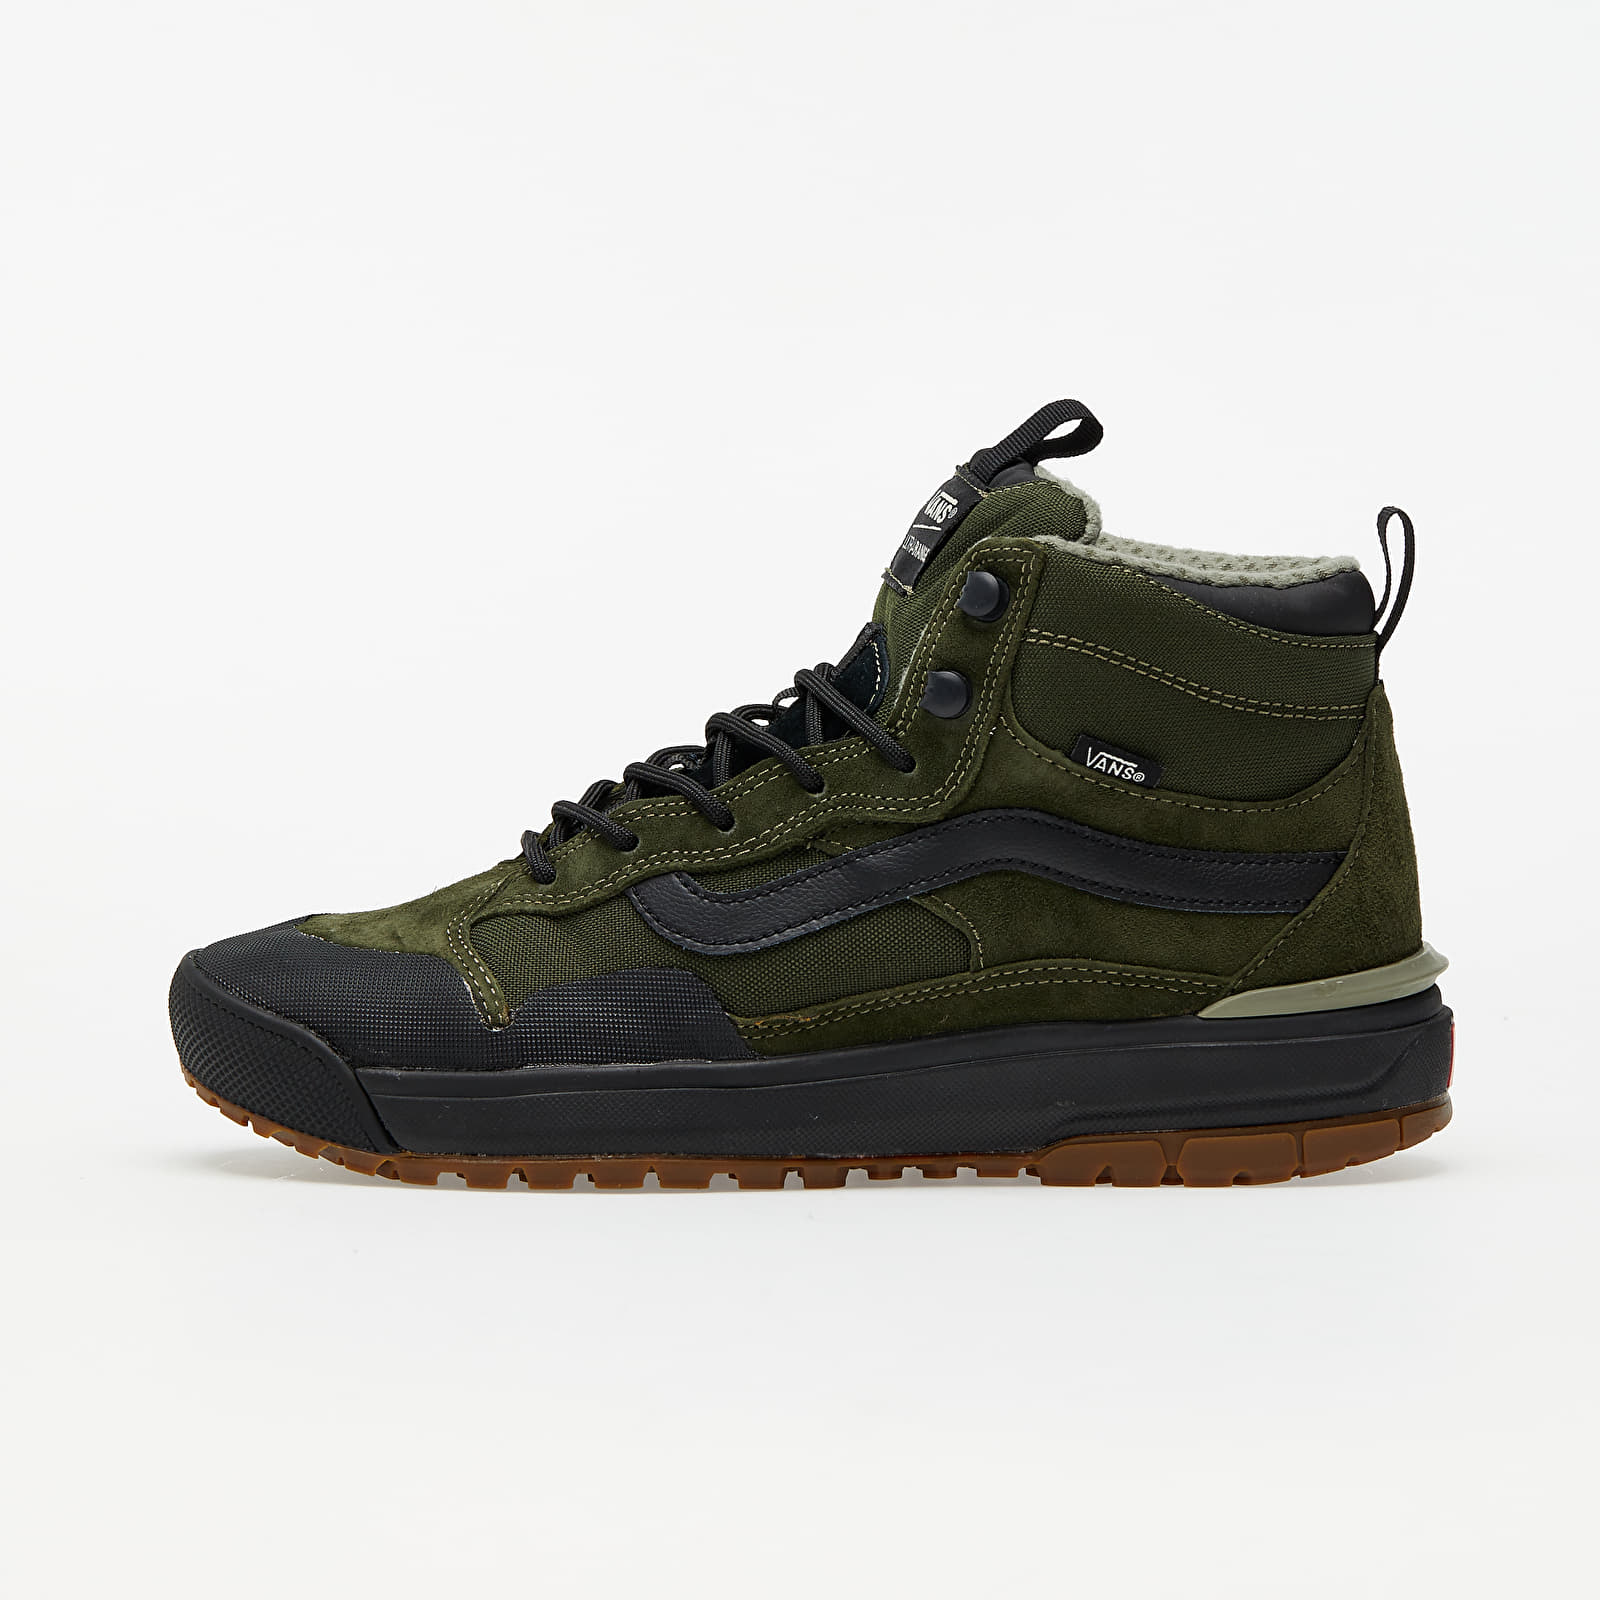 Scarpe e sneaker da uomo Vans Ultrarange Exo Hi (MTE) 66 Supply/ Grape Leaf